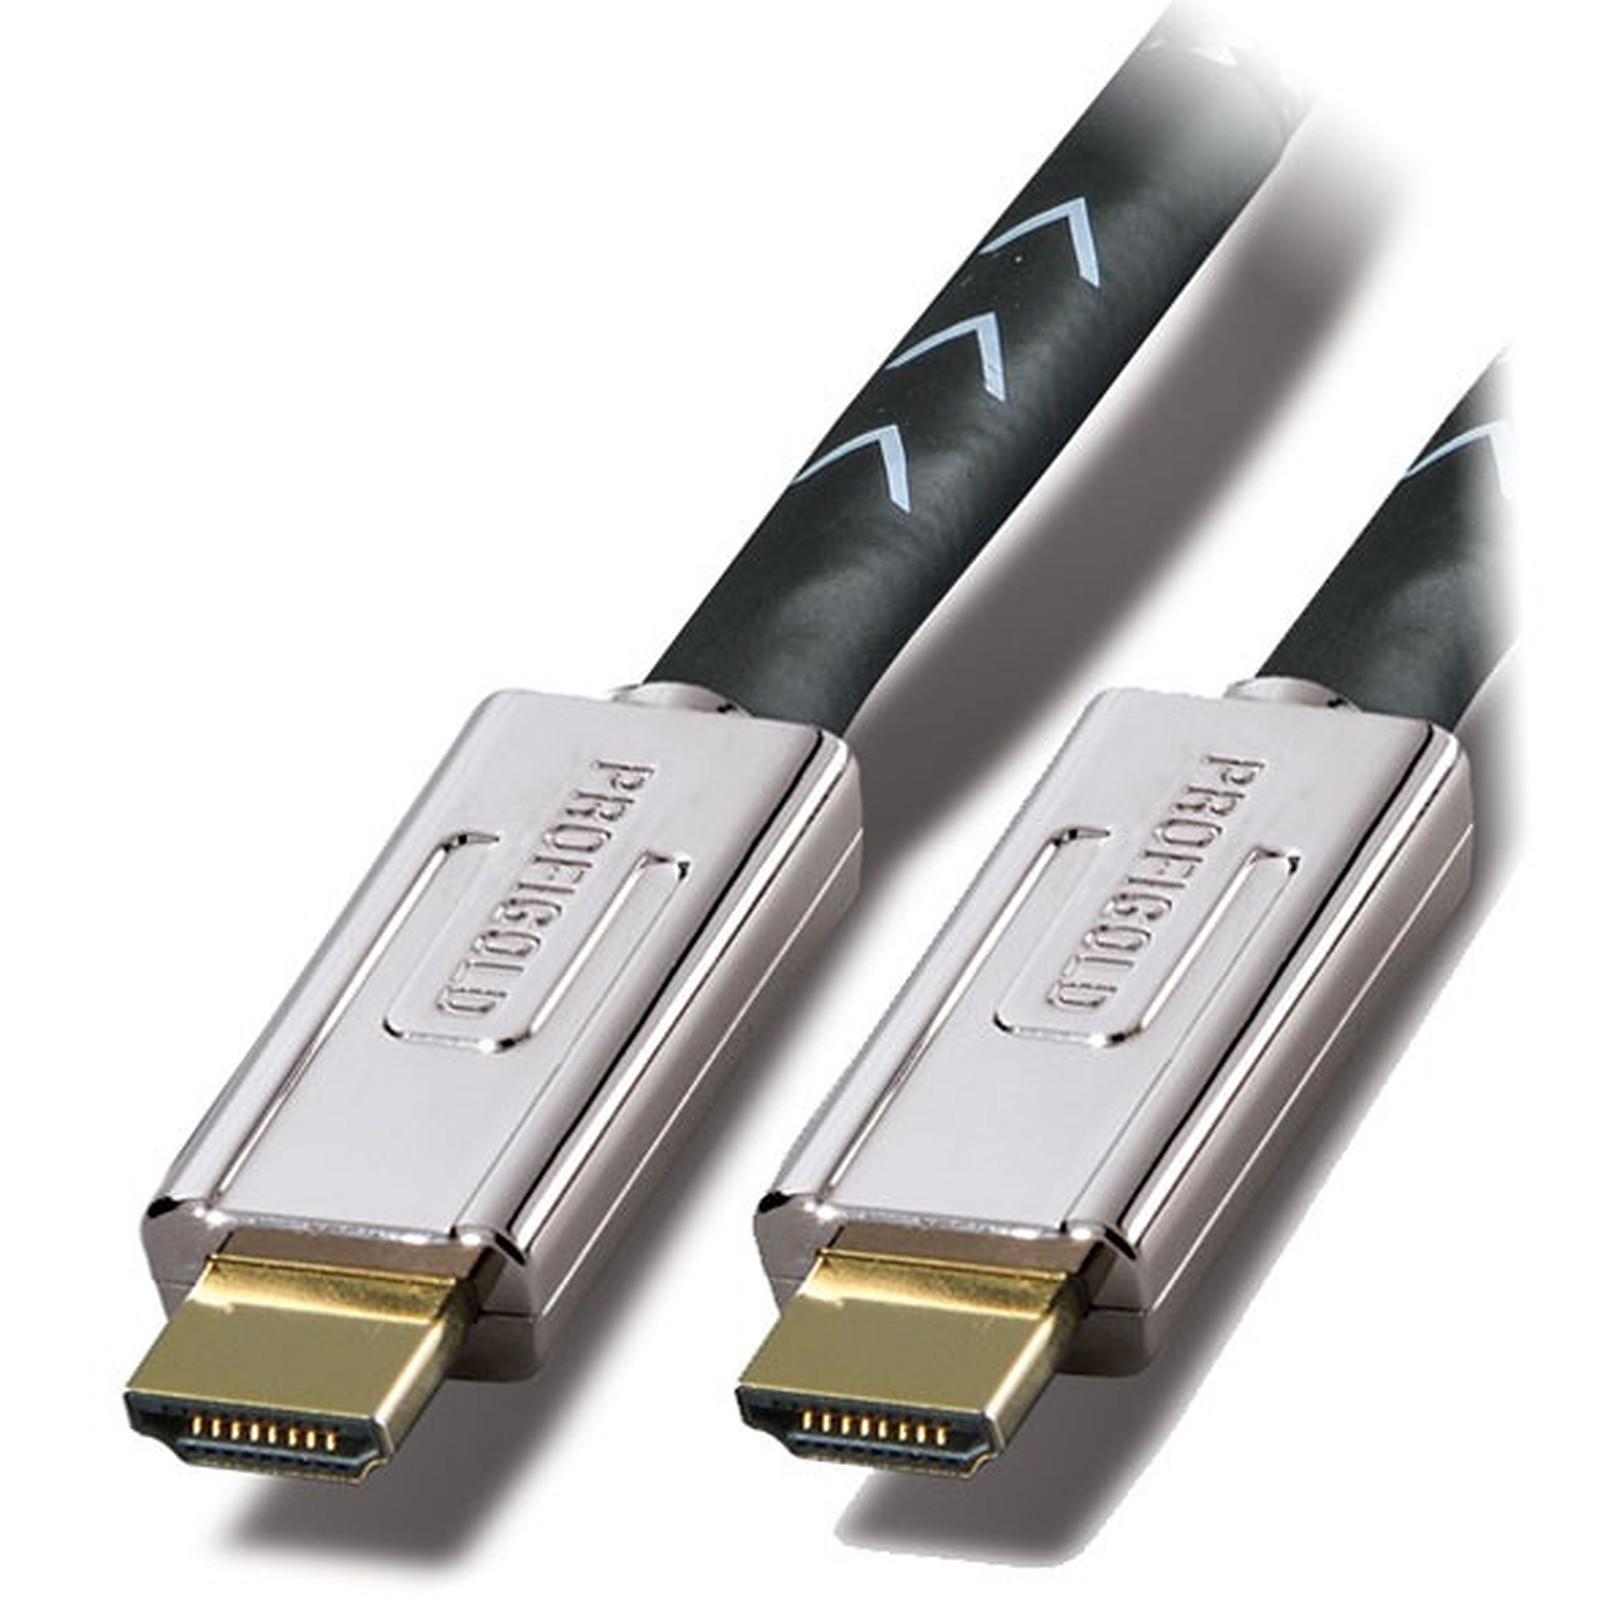 Oxypure OXYV1202 - Câble HDMI 1.4 High Speed mâle / mâle (2 mètres)